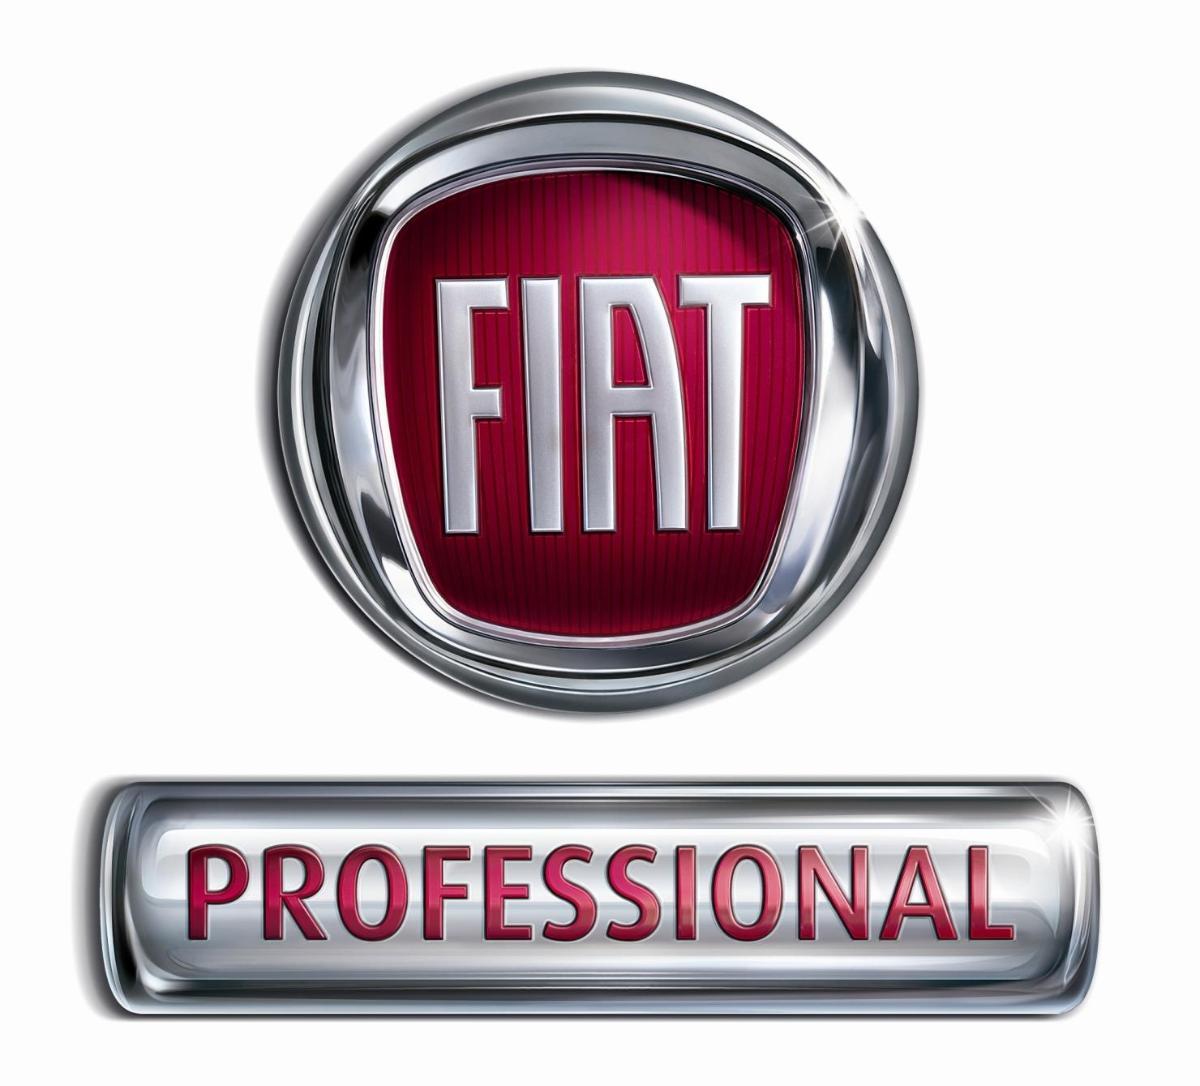 Achat Fiat Professional Essonne 91